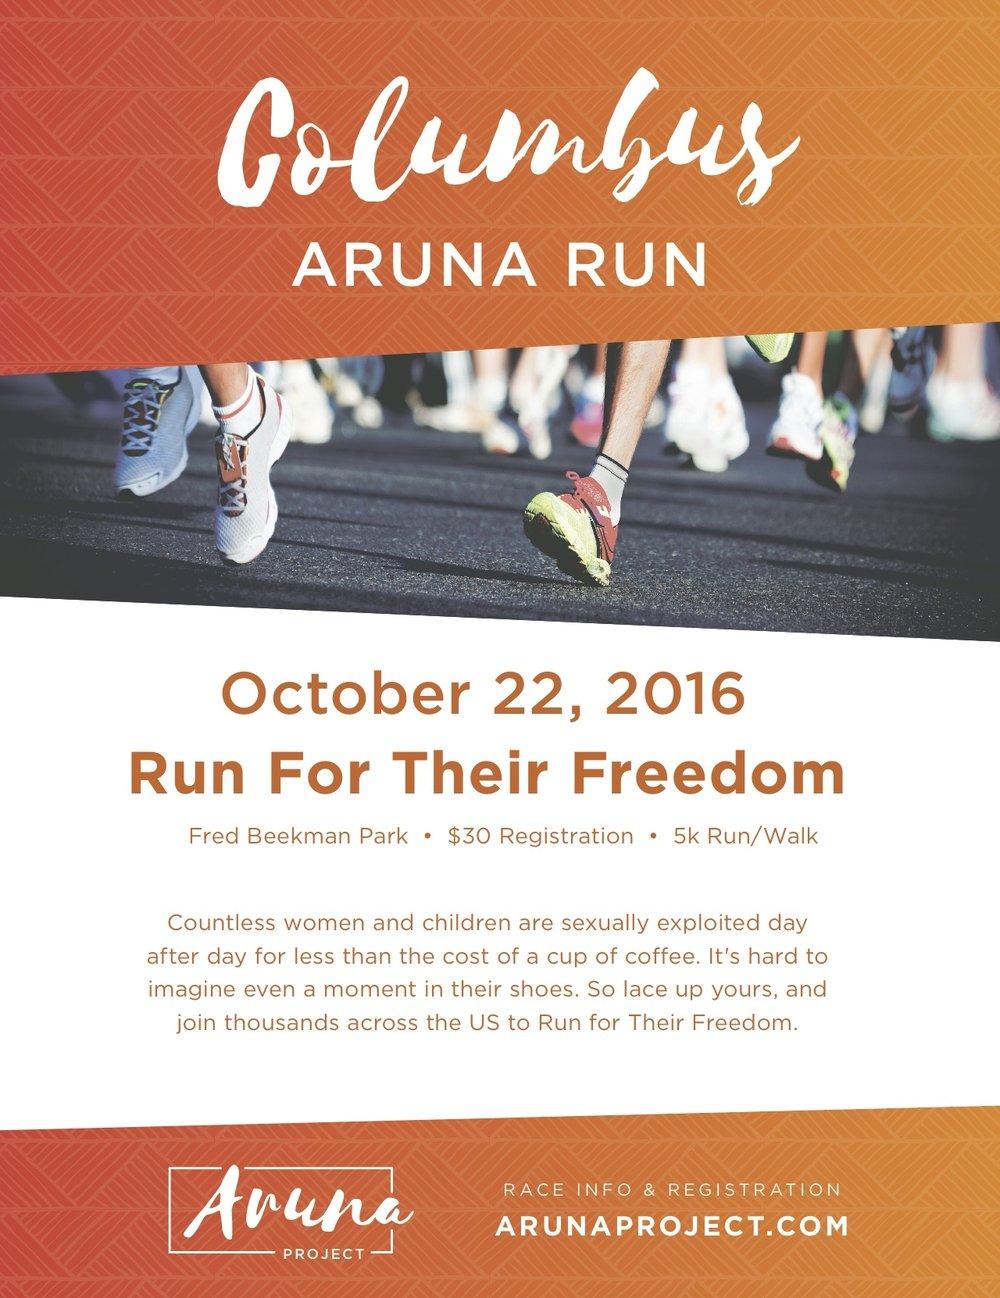 Aruna 5K Promotional Poster